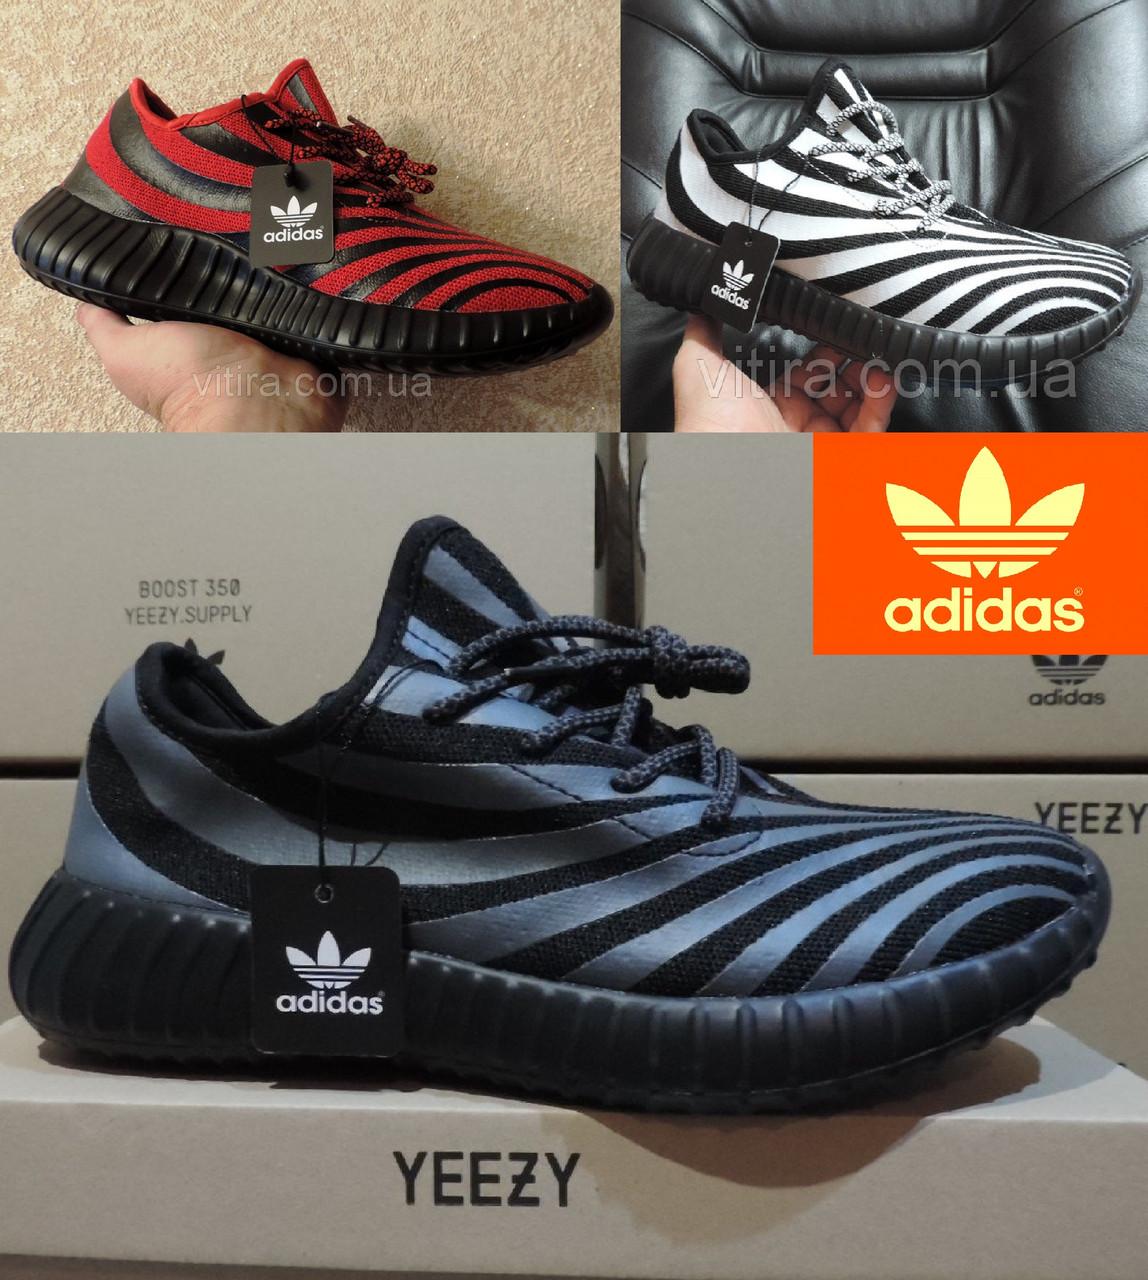 e0de79b1711e06 Кроссовки мужские Adidas Zebra Vintage. Реплика Адидас Yeezy Boost SPLY 350  V2 -